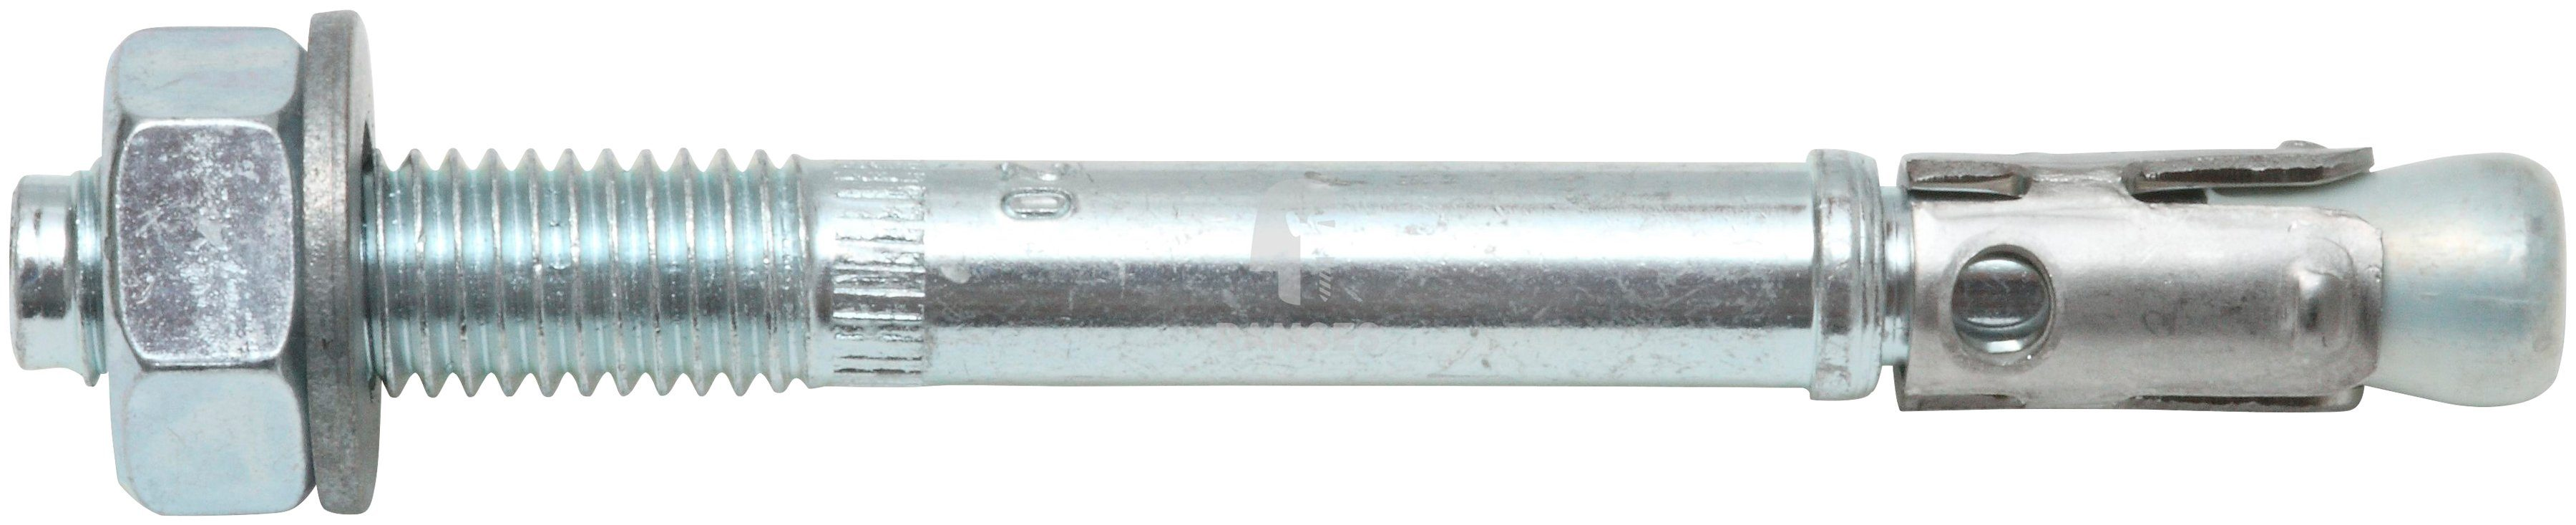 RAMSES Dübel , Bolzenanker BZ plus M12 x 145 mm, 10 Stück